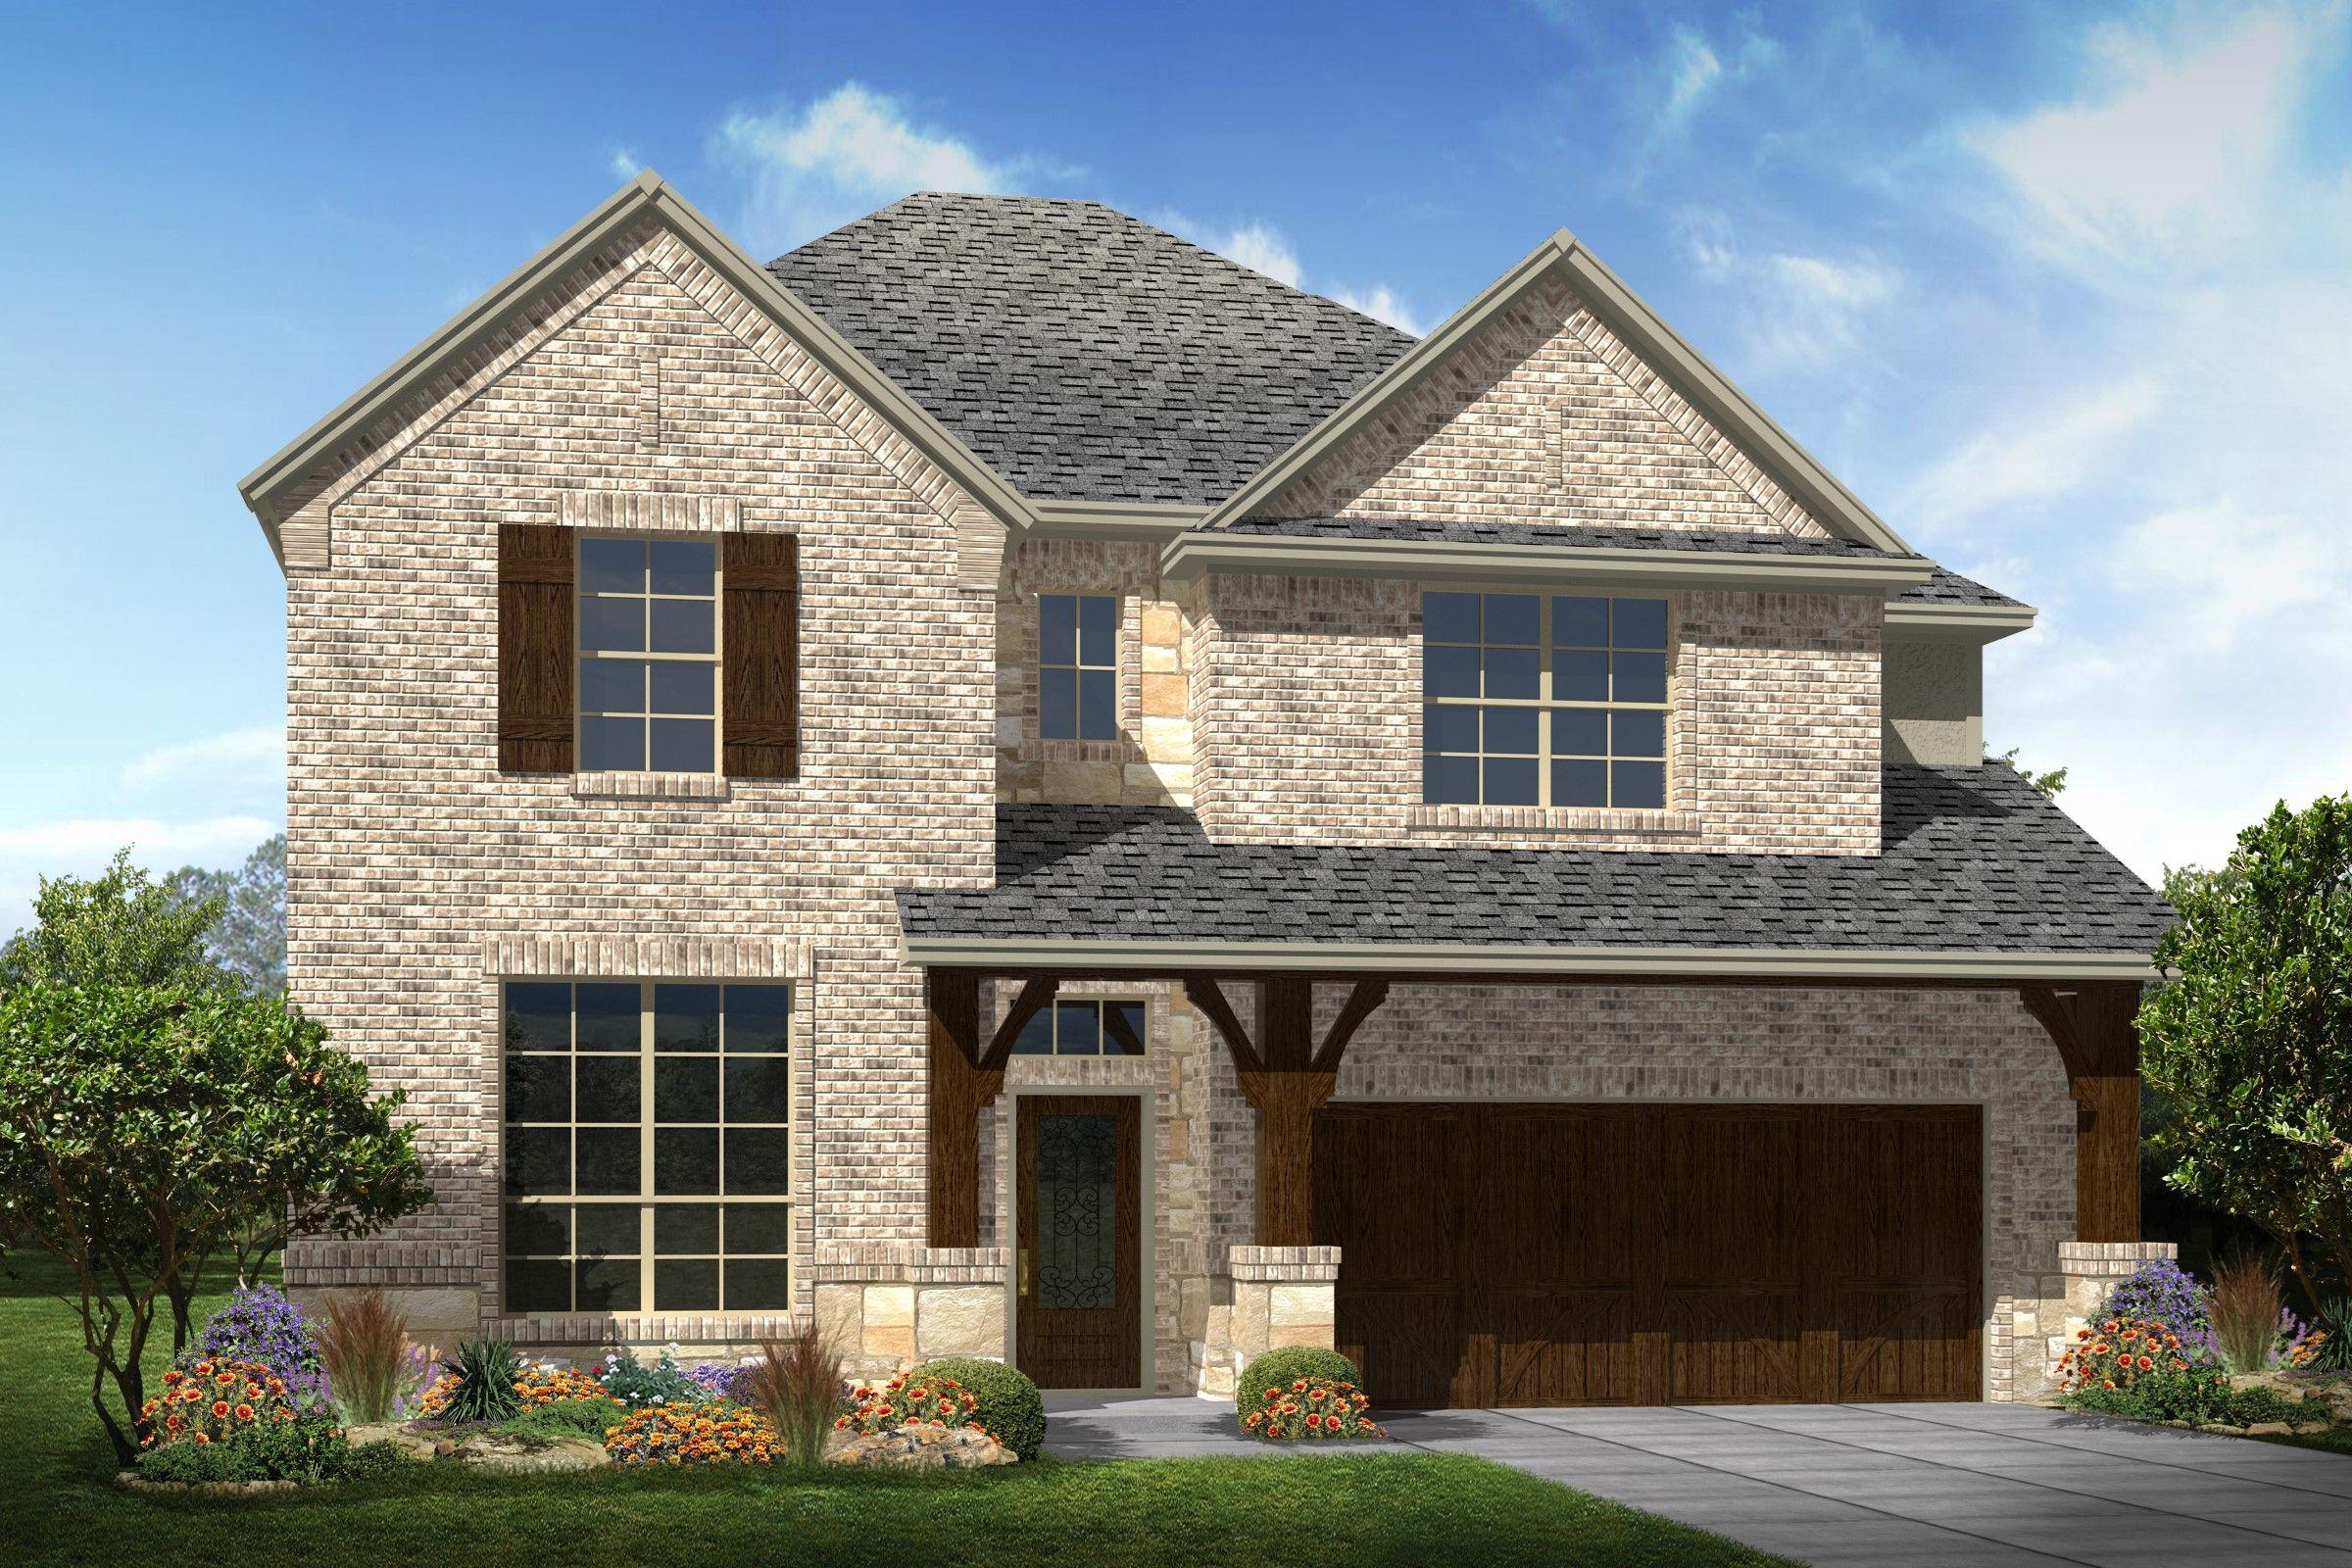 1418 Medina Trail, Homesite D-25, Euless, TX Homes & Land - Real Estate